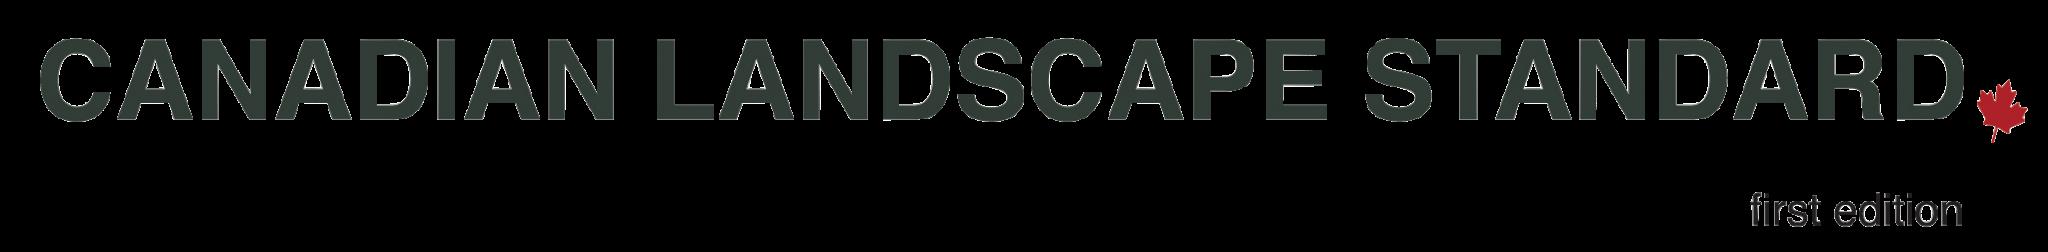 Cdn Landscape Standard Title Logo